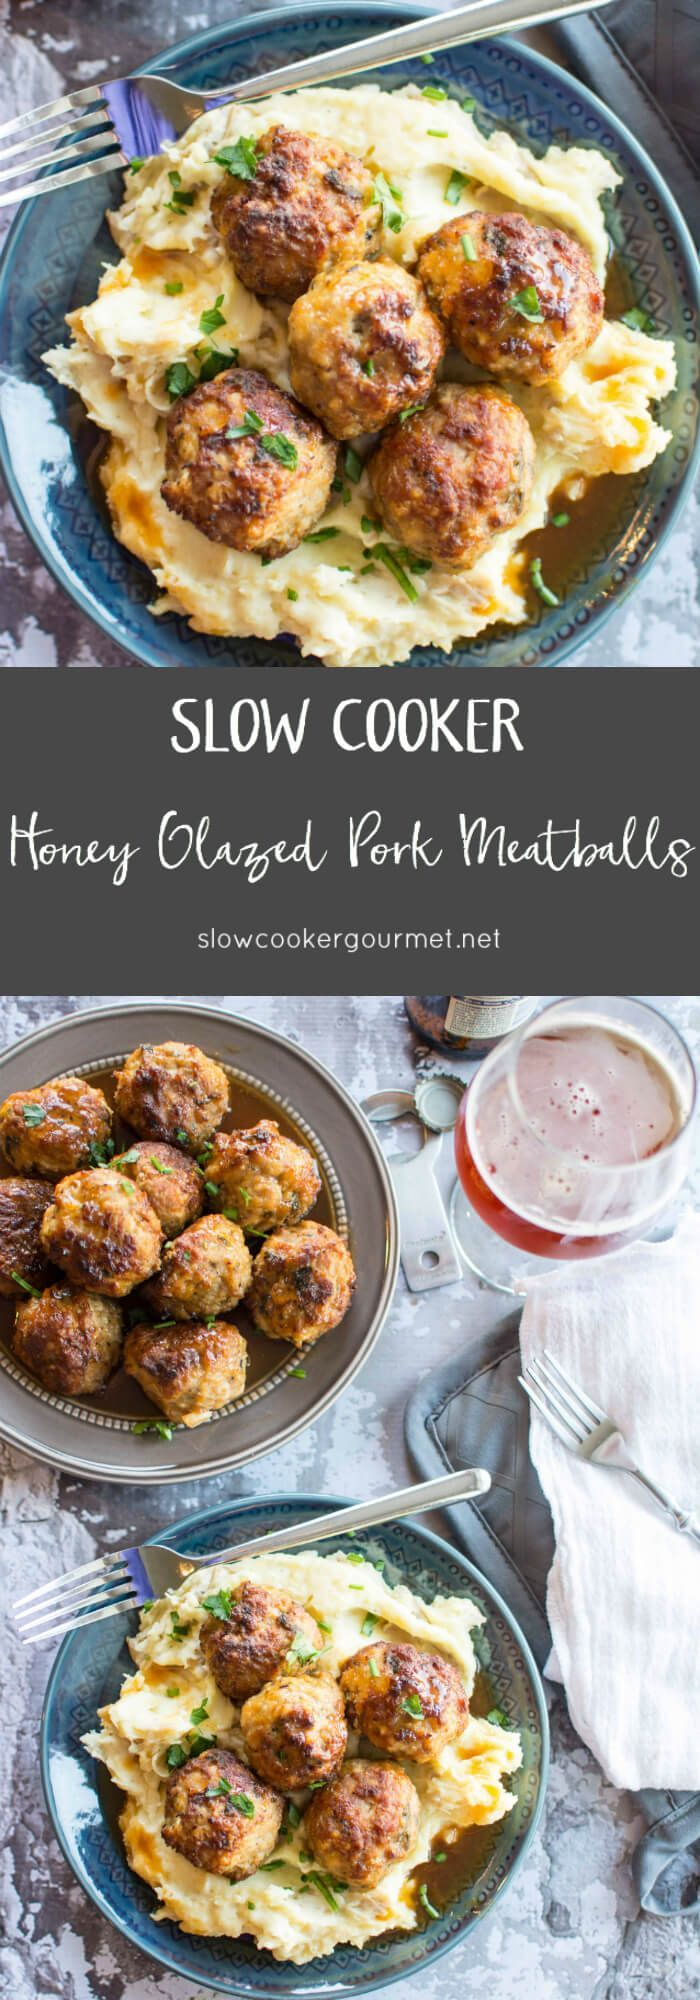 scg-honey-glazed-pork-meatballs-longpin